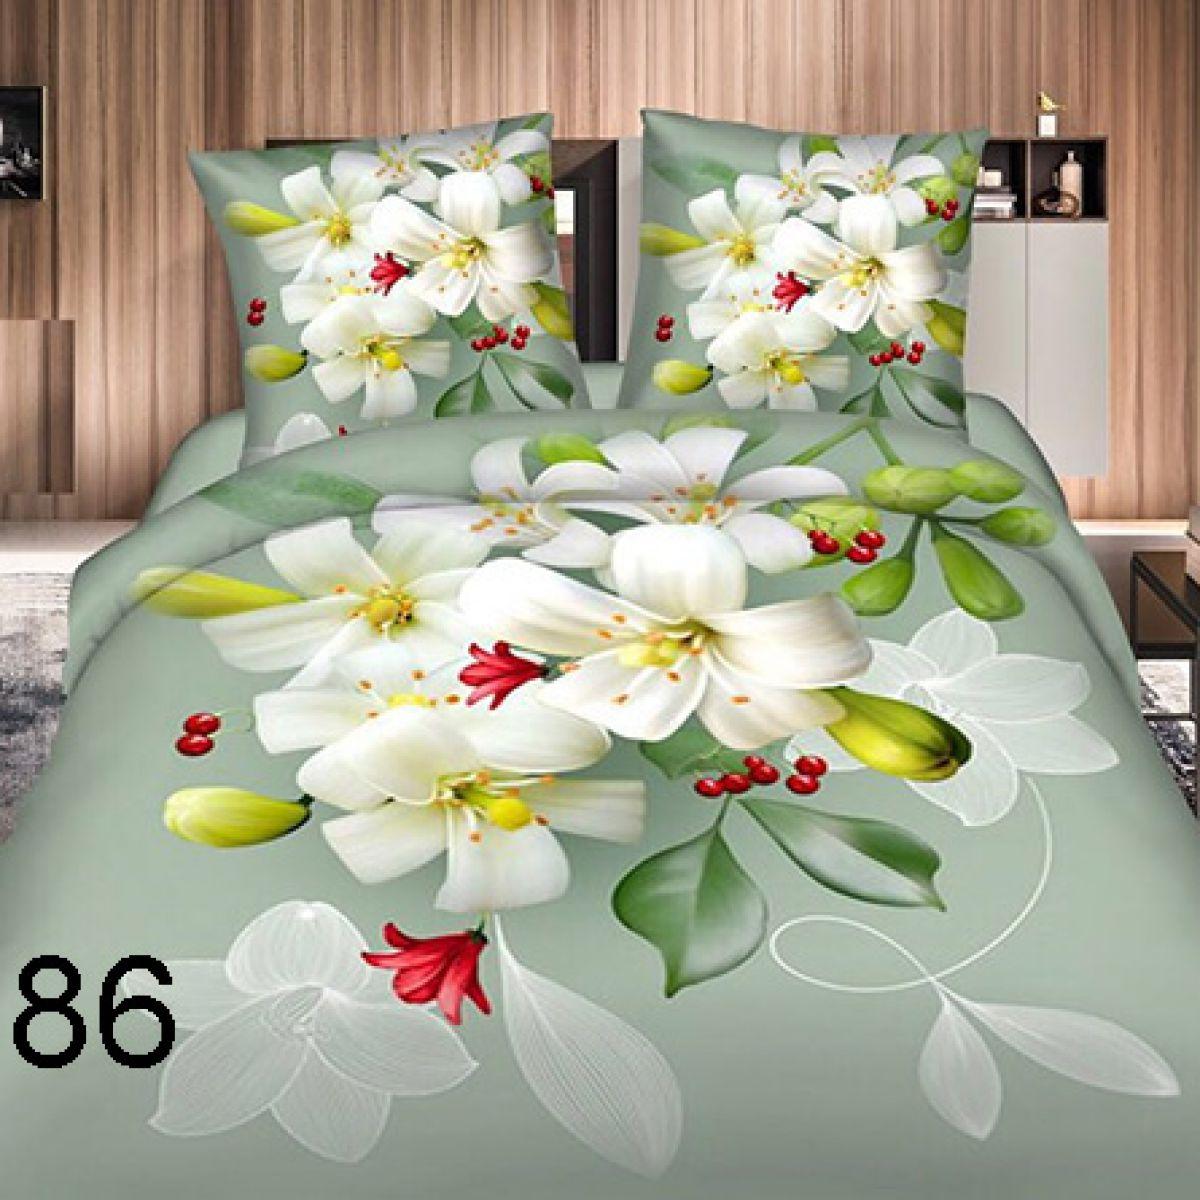 3D Beddings - Antonio - AML-86 - 160x200 cm - 4 pcs